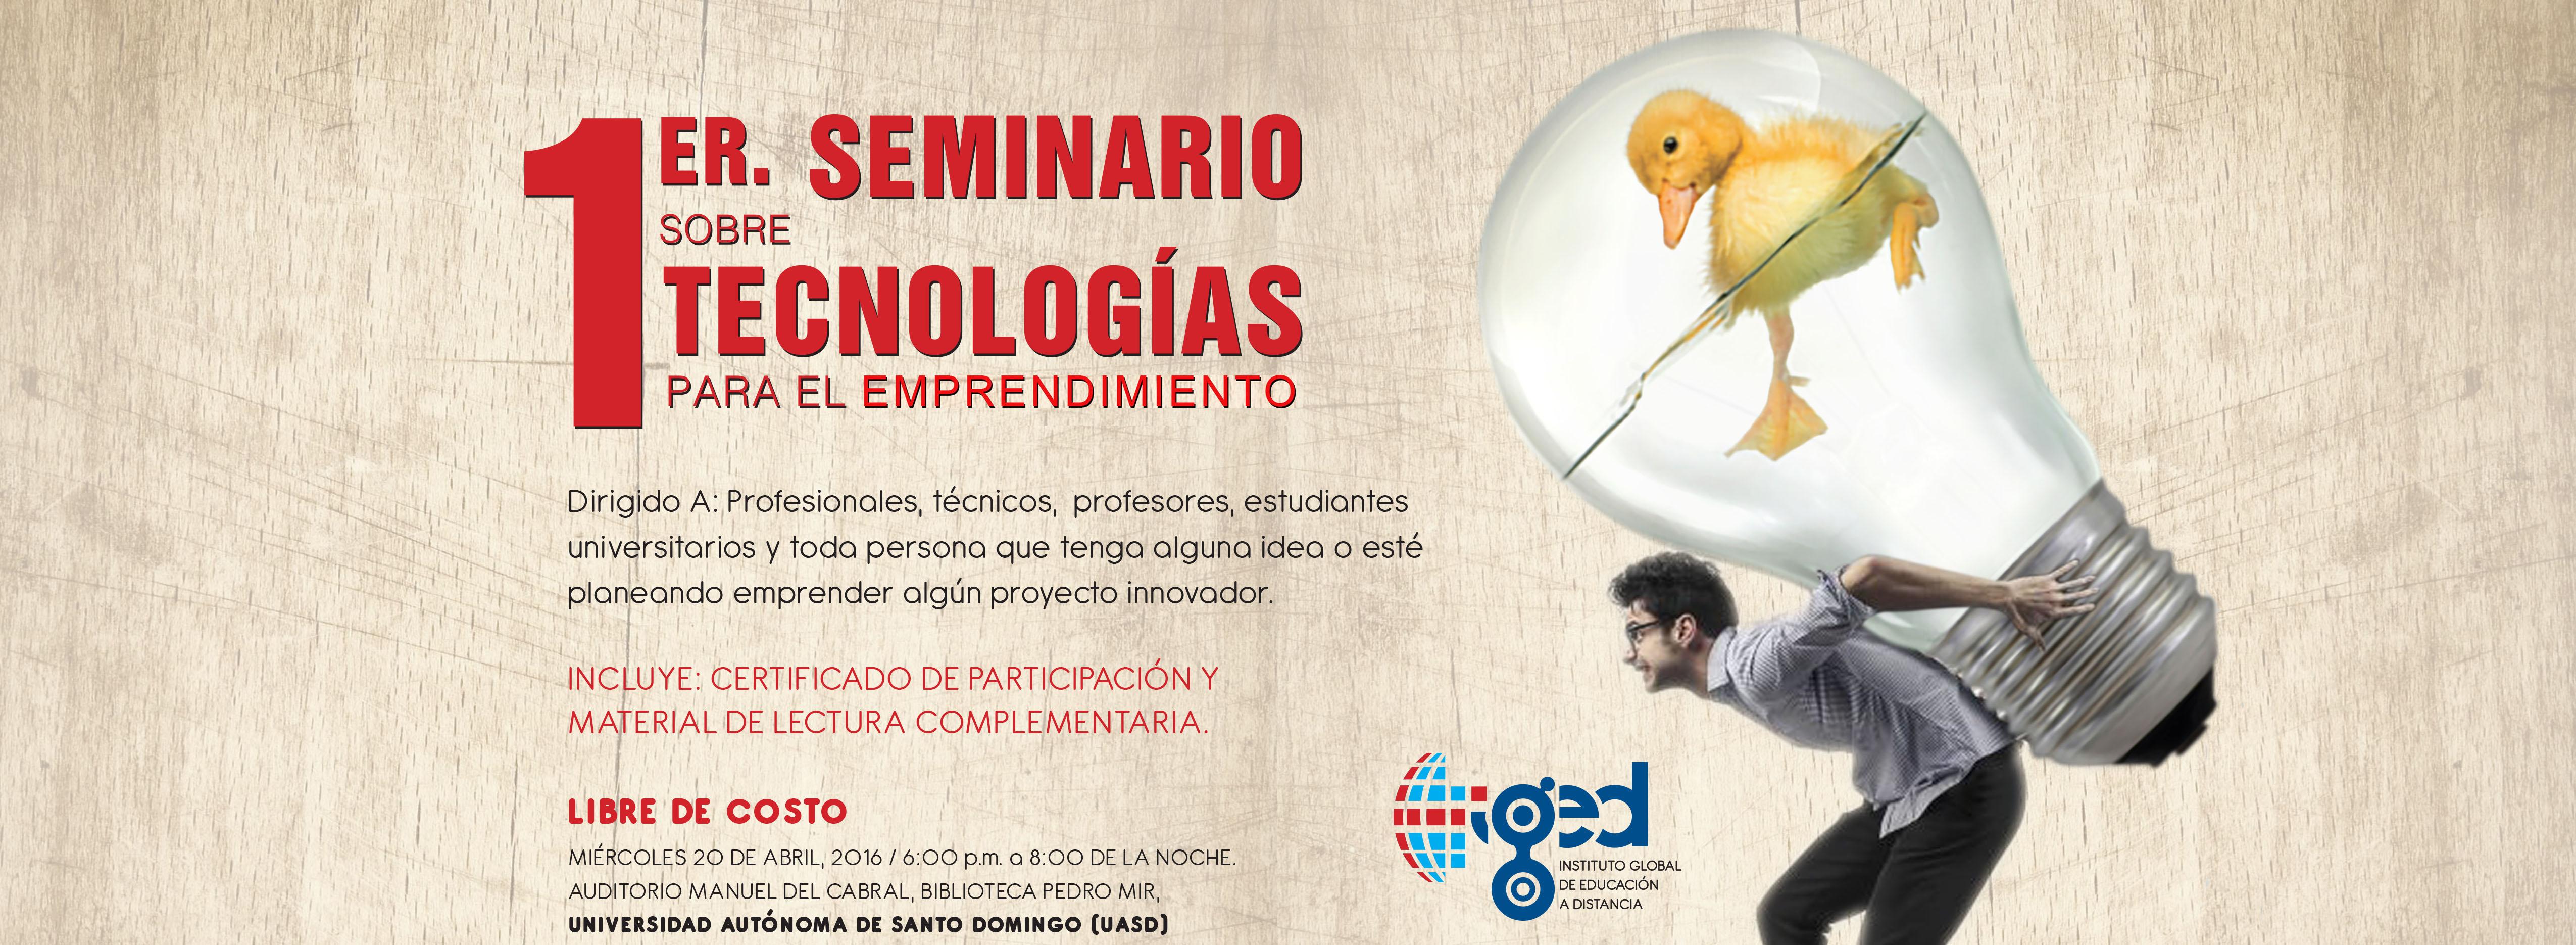 Instituto Global de Eduacion a Distancia.